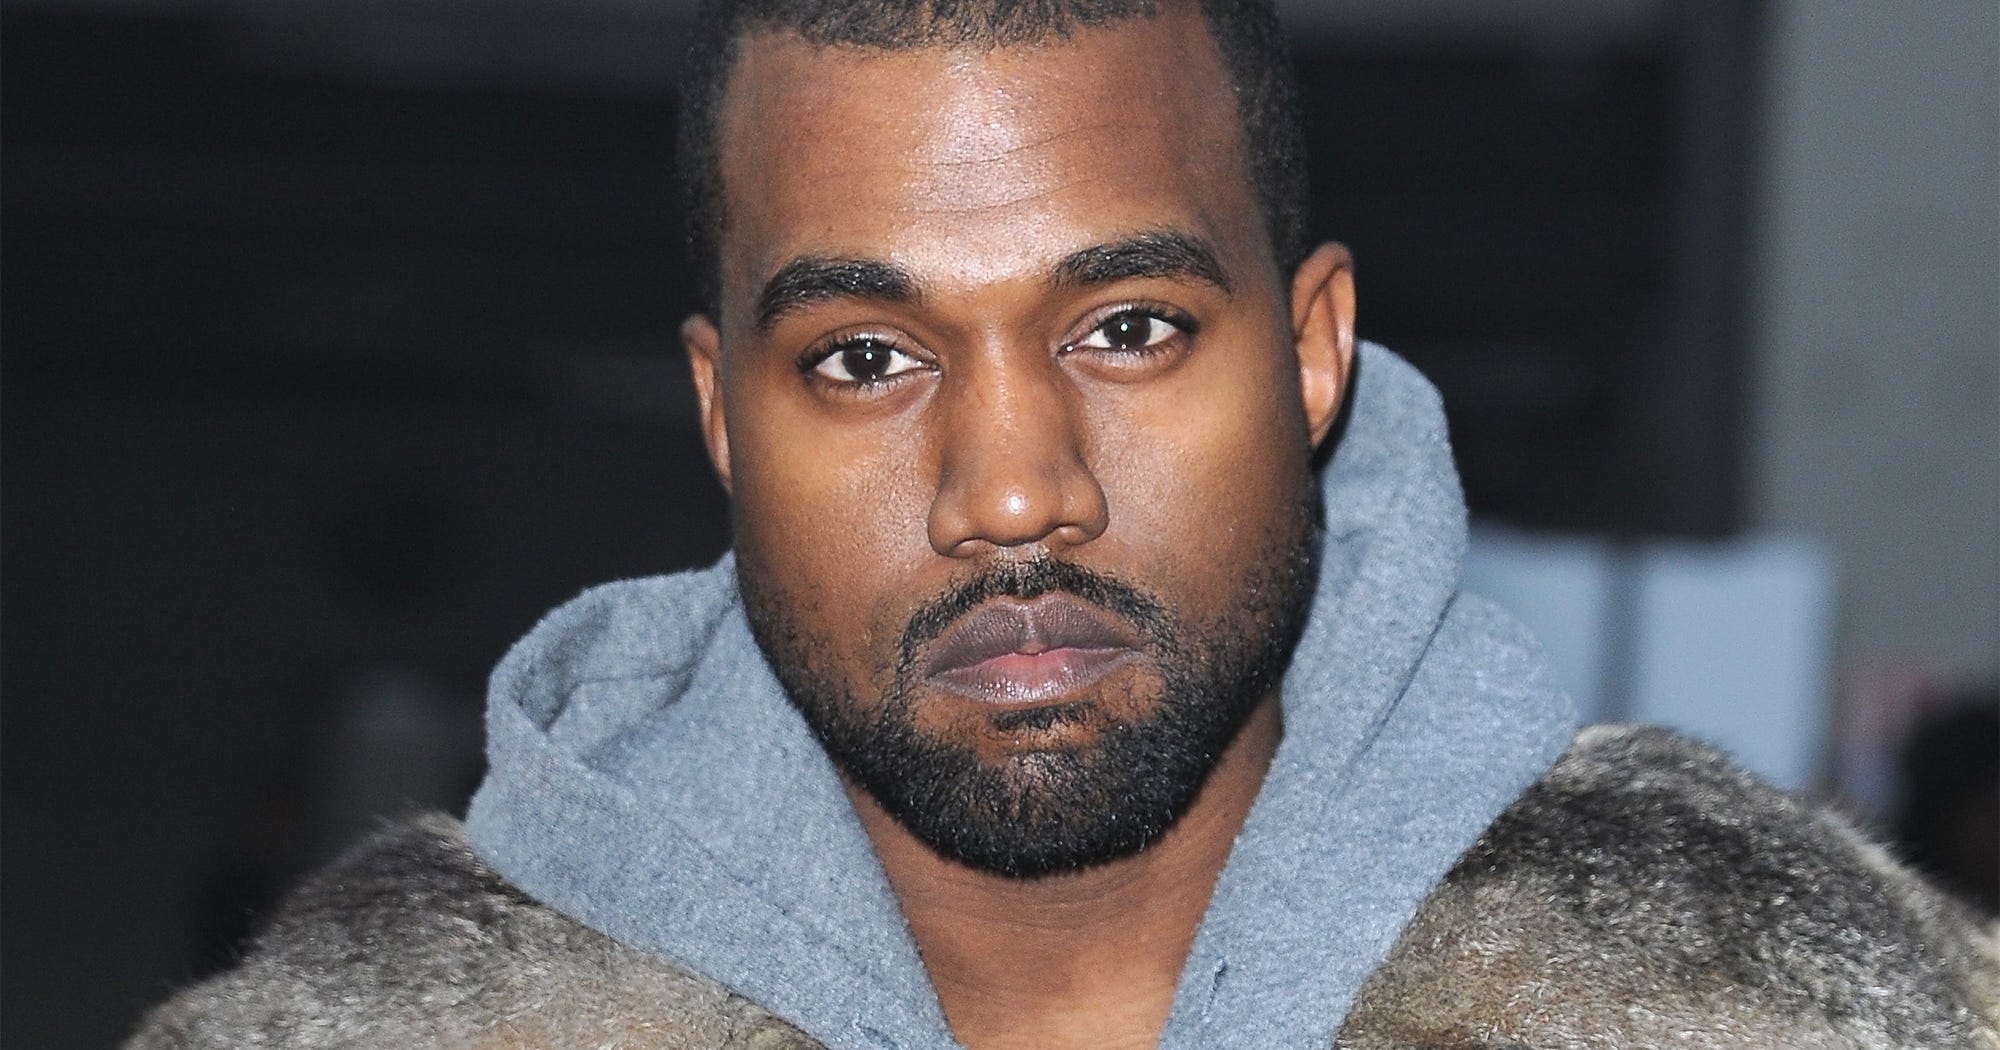 Kanye West Doing Karaoke With Mark Zuckerberg Is Cursed